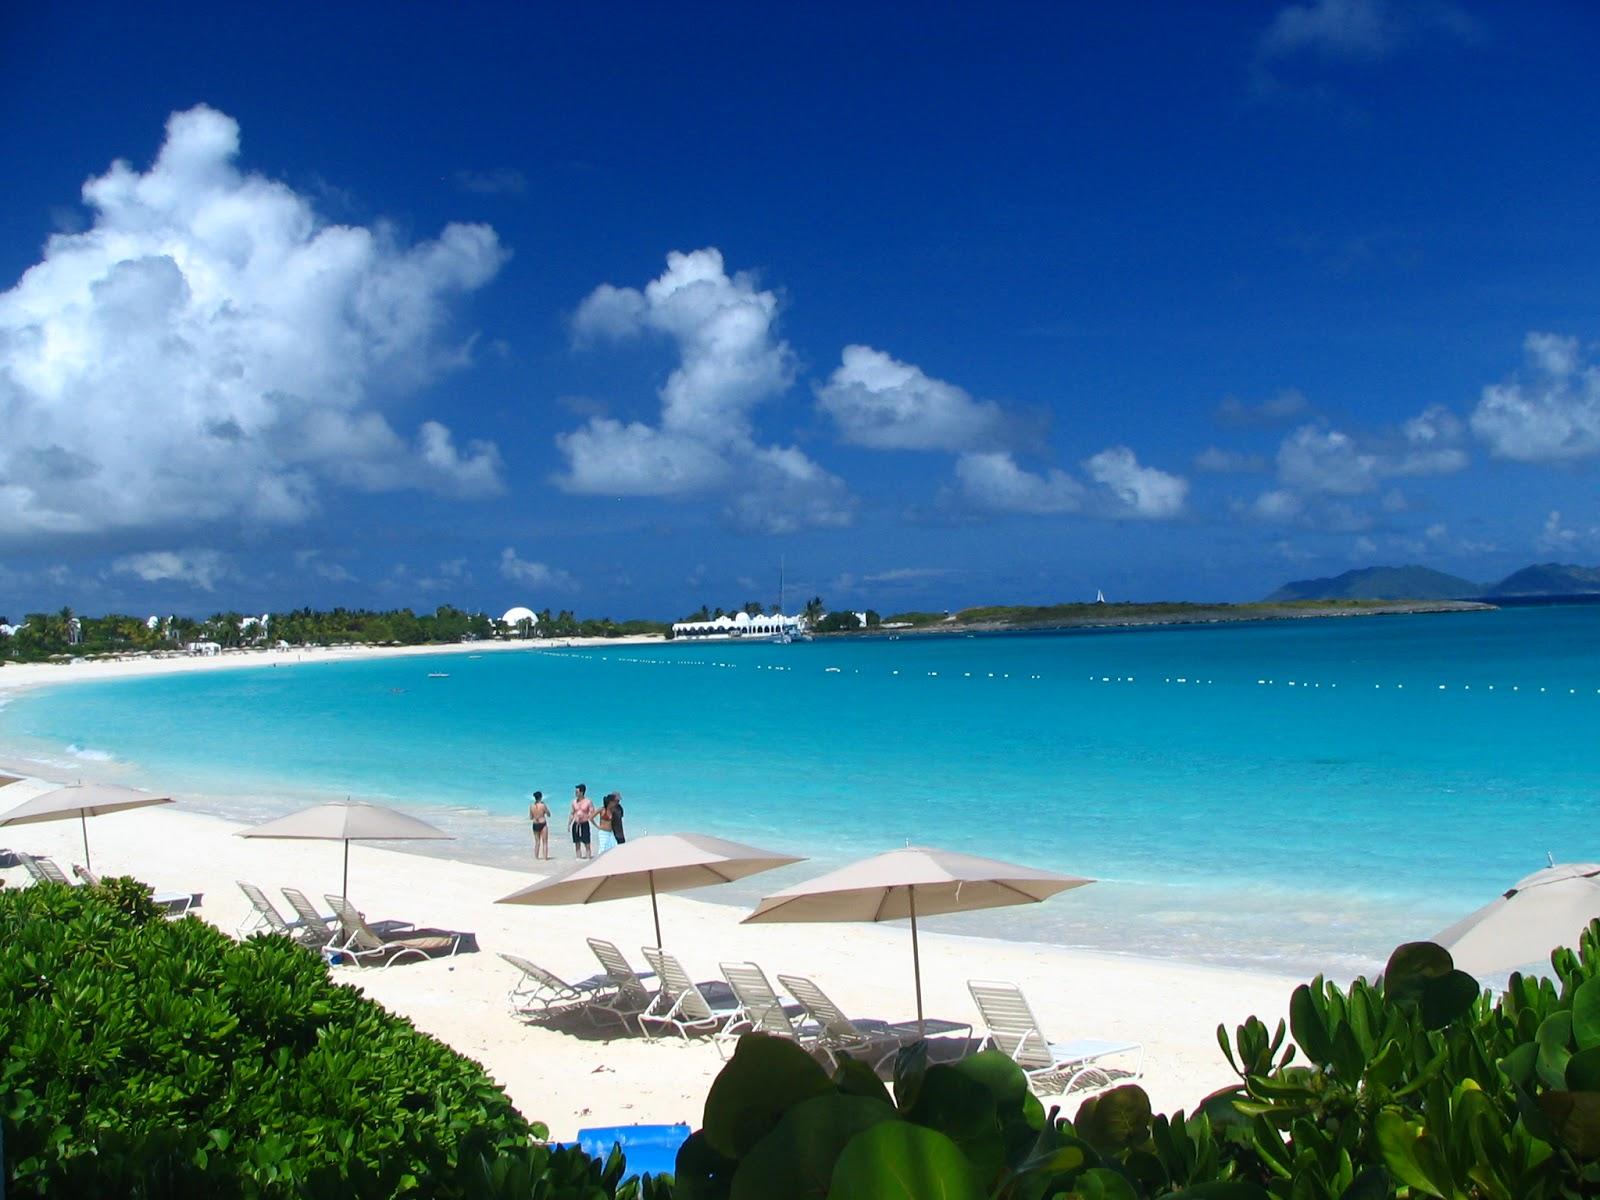 Caribbean Beaches Islands: Tourist Destinations